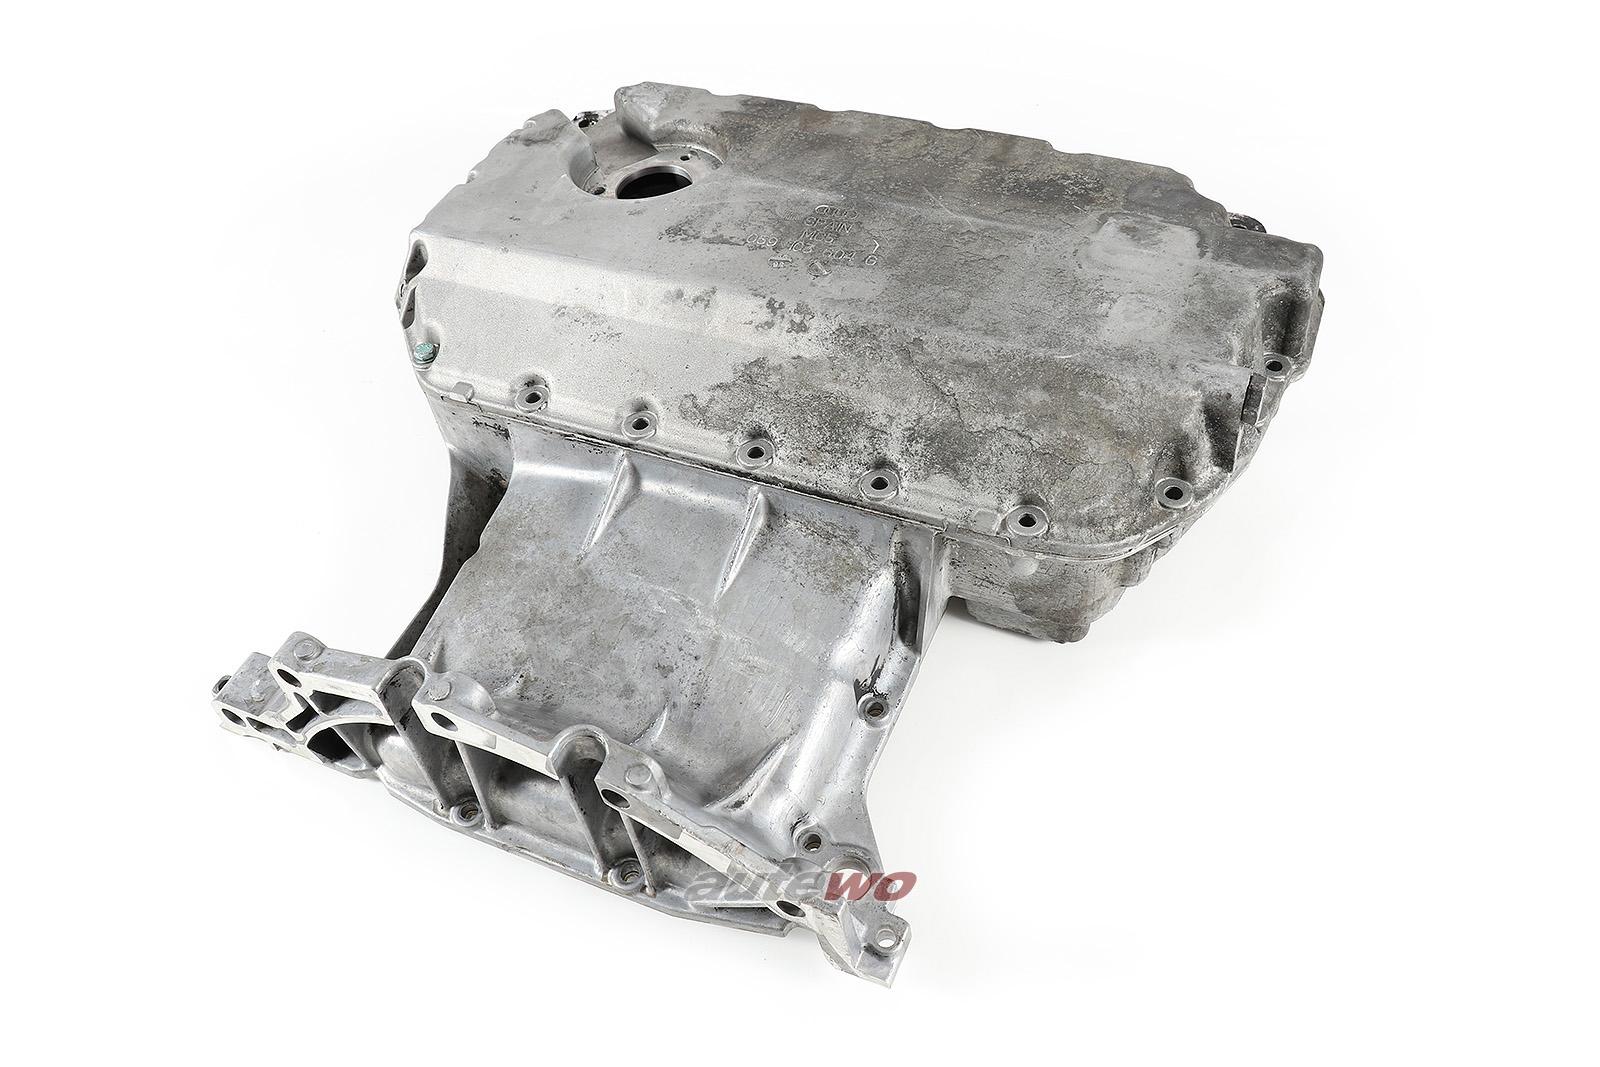 079103604G/059103603K Audi A4 B5/8E/A6/Allroad 4B/A8 D2 2.5l TDI Ölwanne